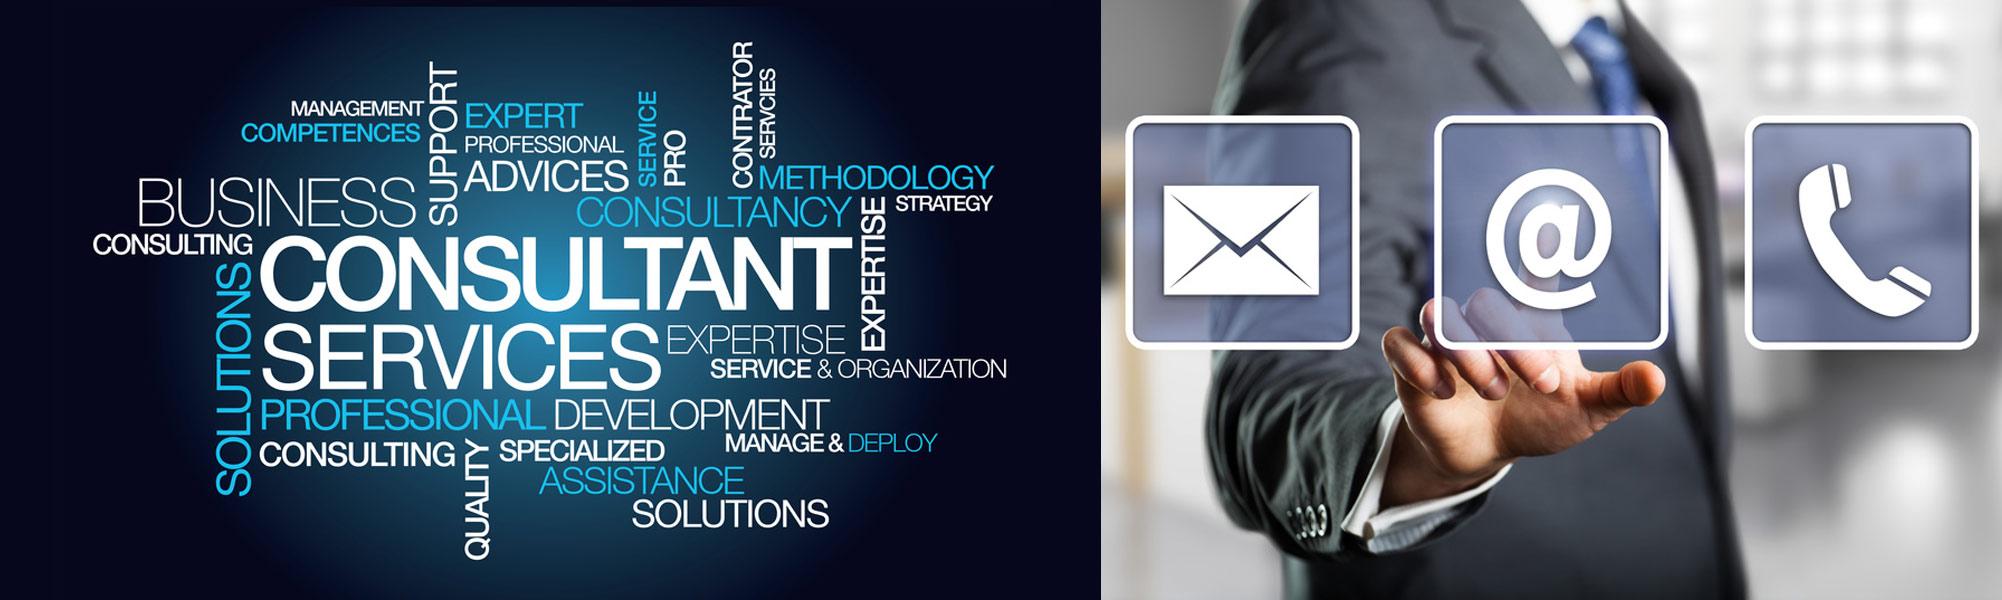 Kontakt IT & Netsolutions